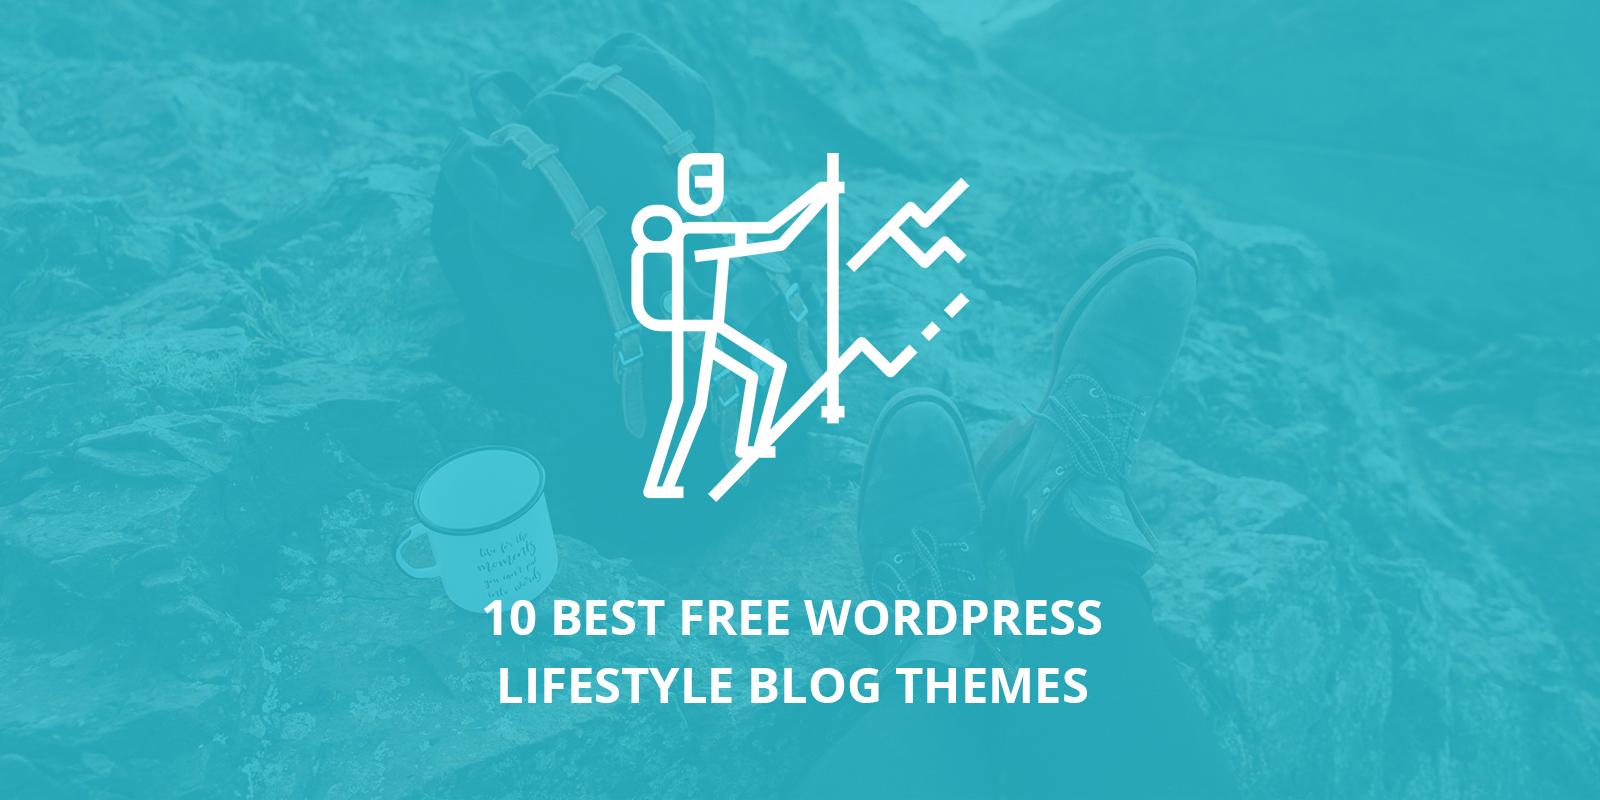 10 Best Free WordPress Blog Themes 2019 1